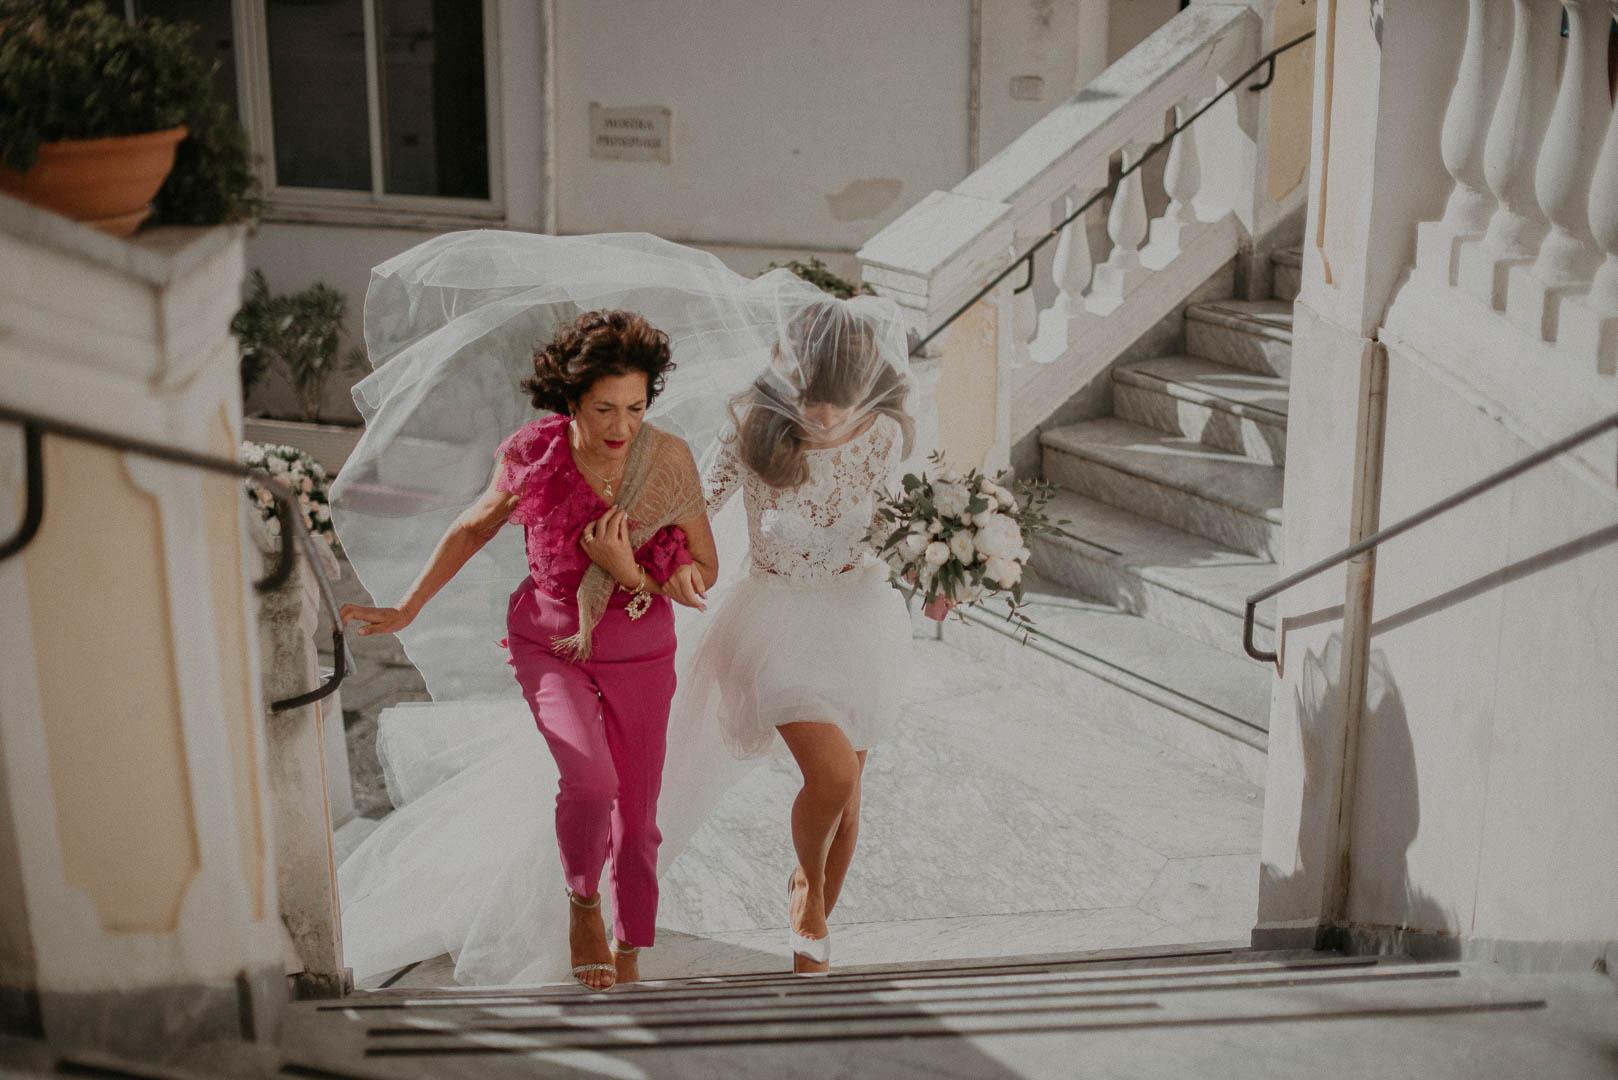 wedding-photographer-destination-fineart-bespoke-reportage-napoli-nabilah-vivianeizzo-spazio46-55